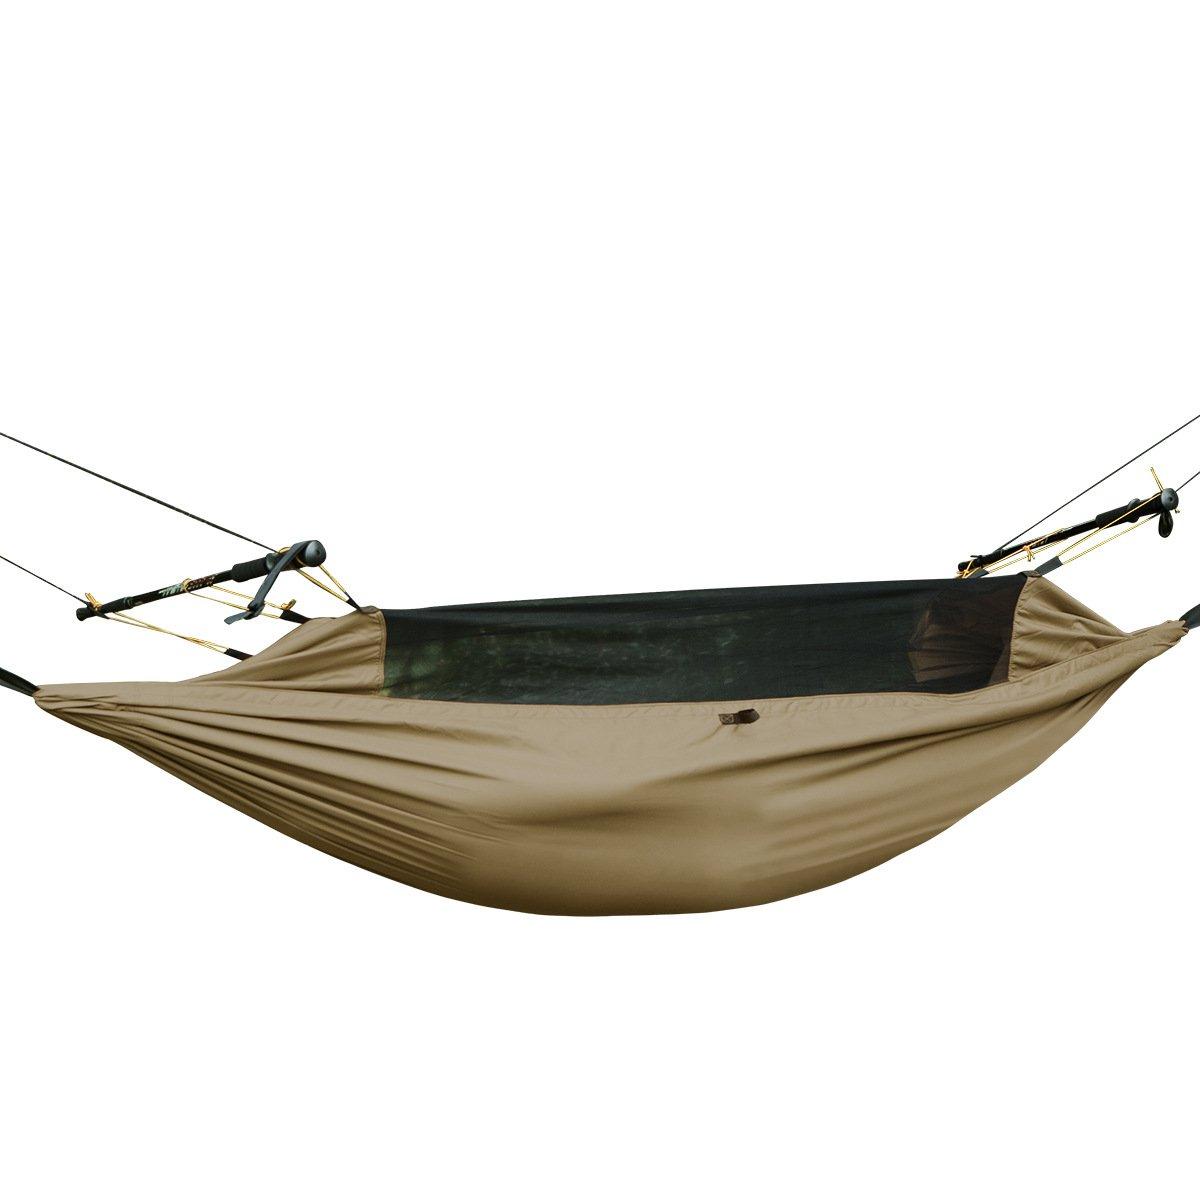 FREE SOLDIER Survival Outdoor multifunción portátil colgar cama con  mosquitera ligero Tactical paracaídas hamaca 388b06e64a3